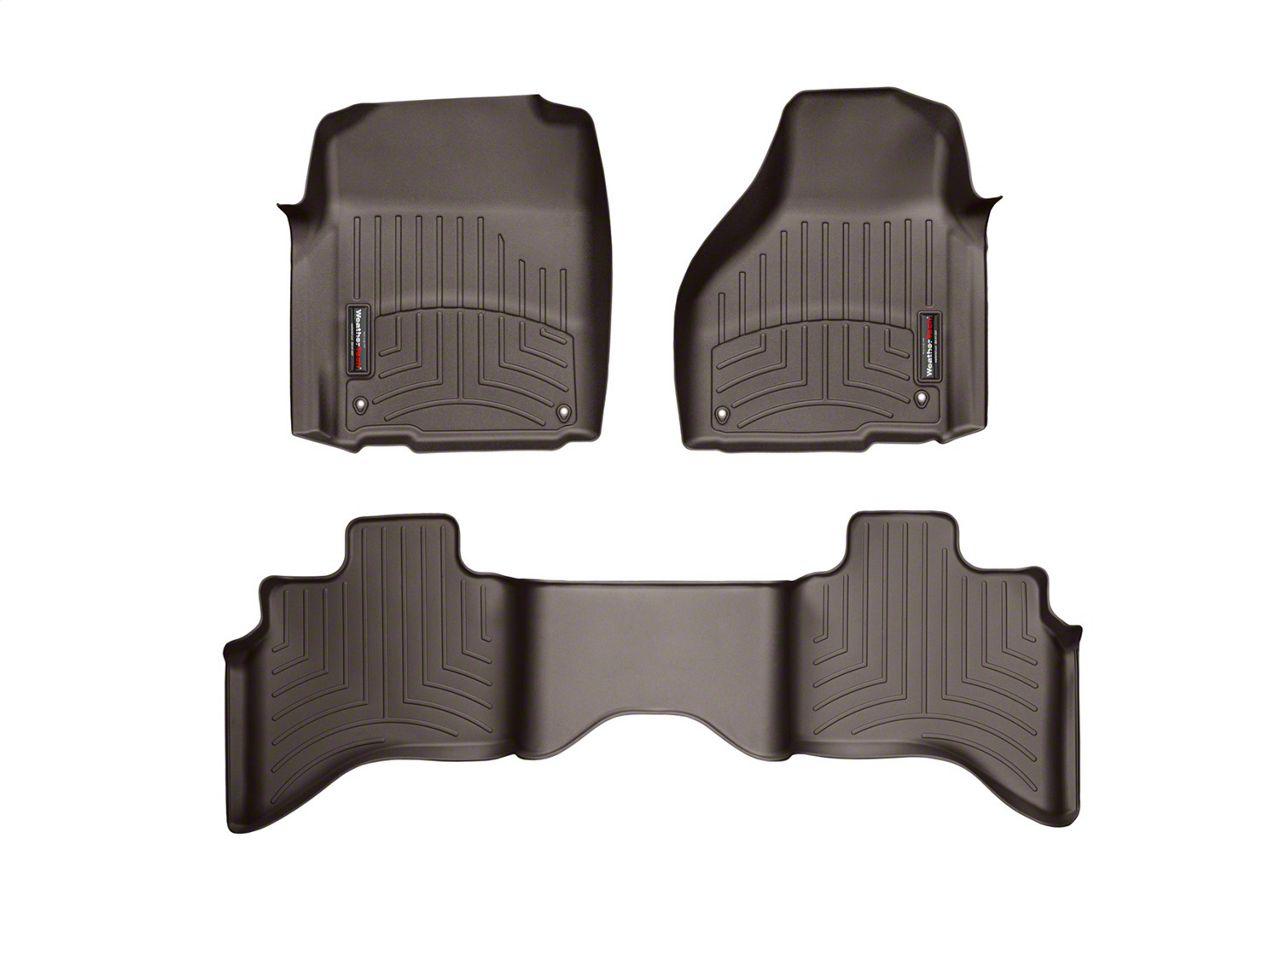 Weathertech DigitalFit Front & Rear Floor Liners - Cocoa (09-18 RAM 1500 Quad Cab)